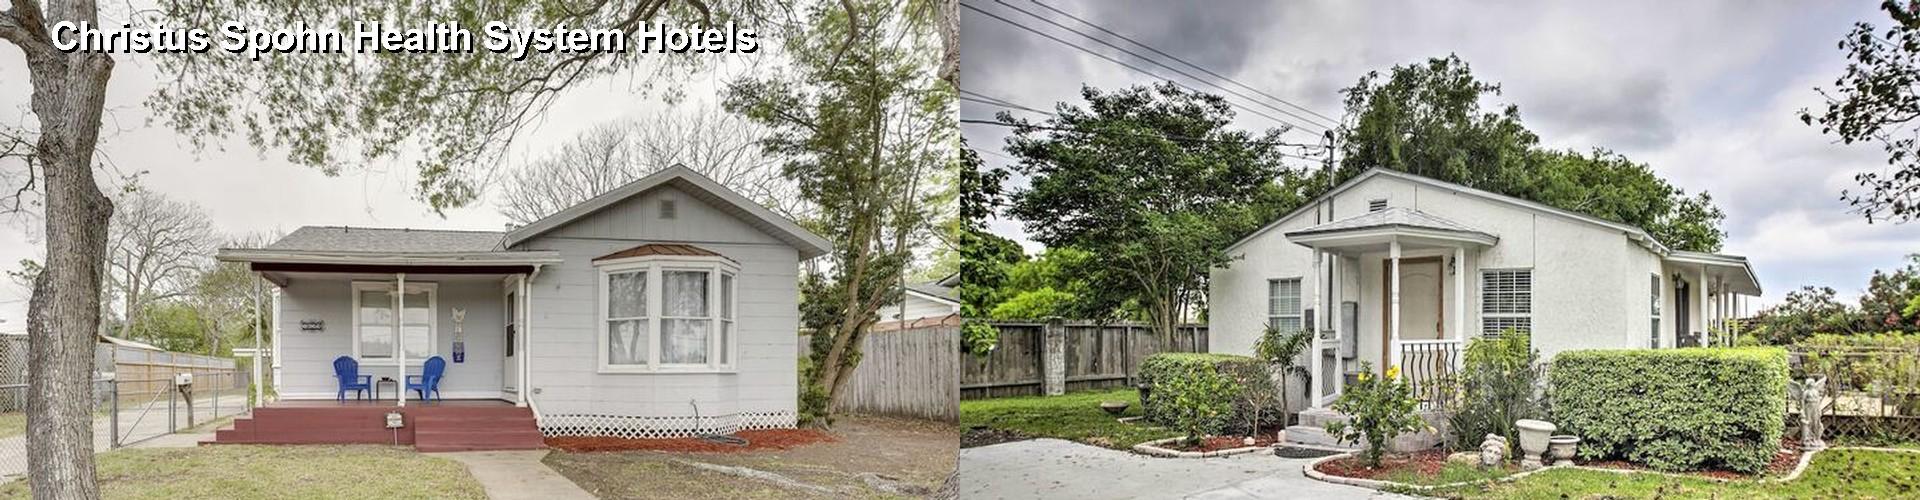 5 Best Hotels Near Christus Spohn Health System